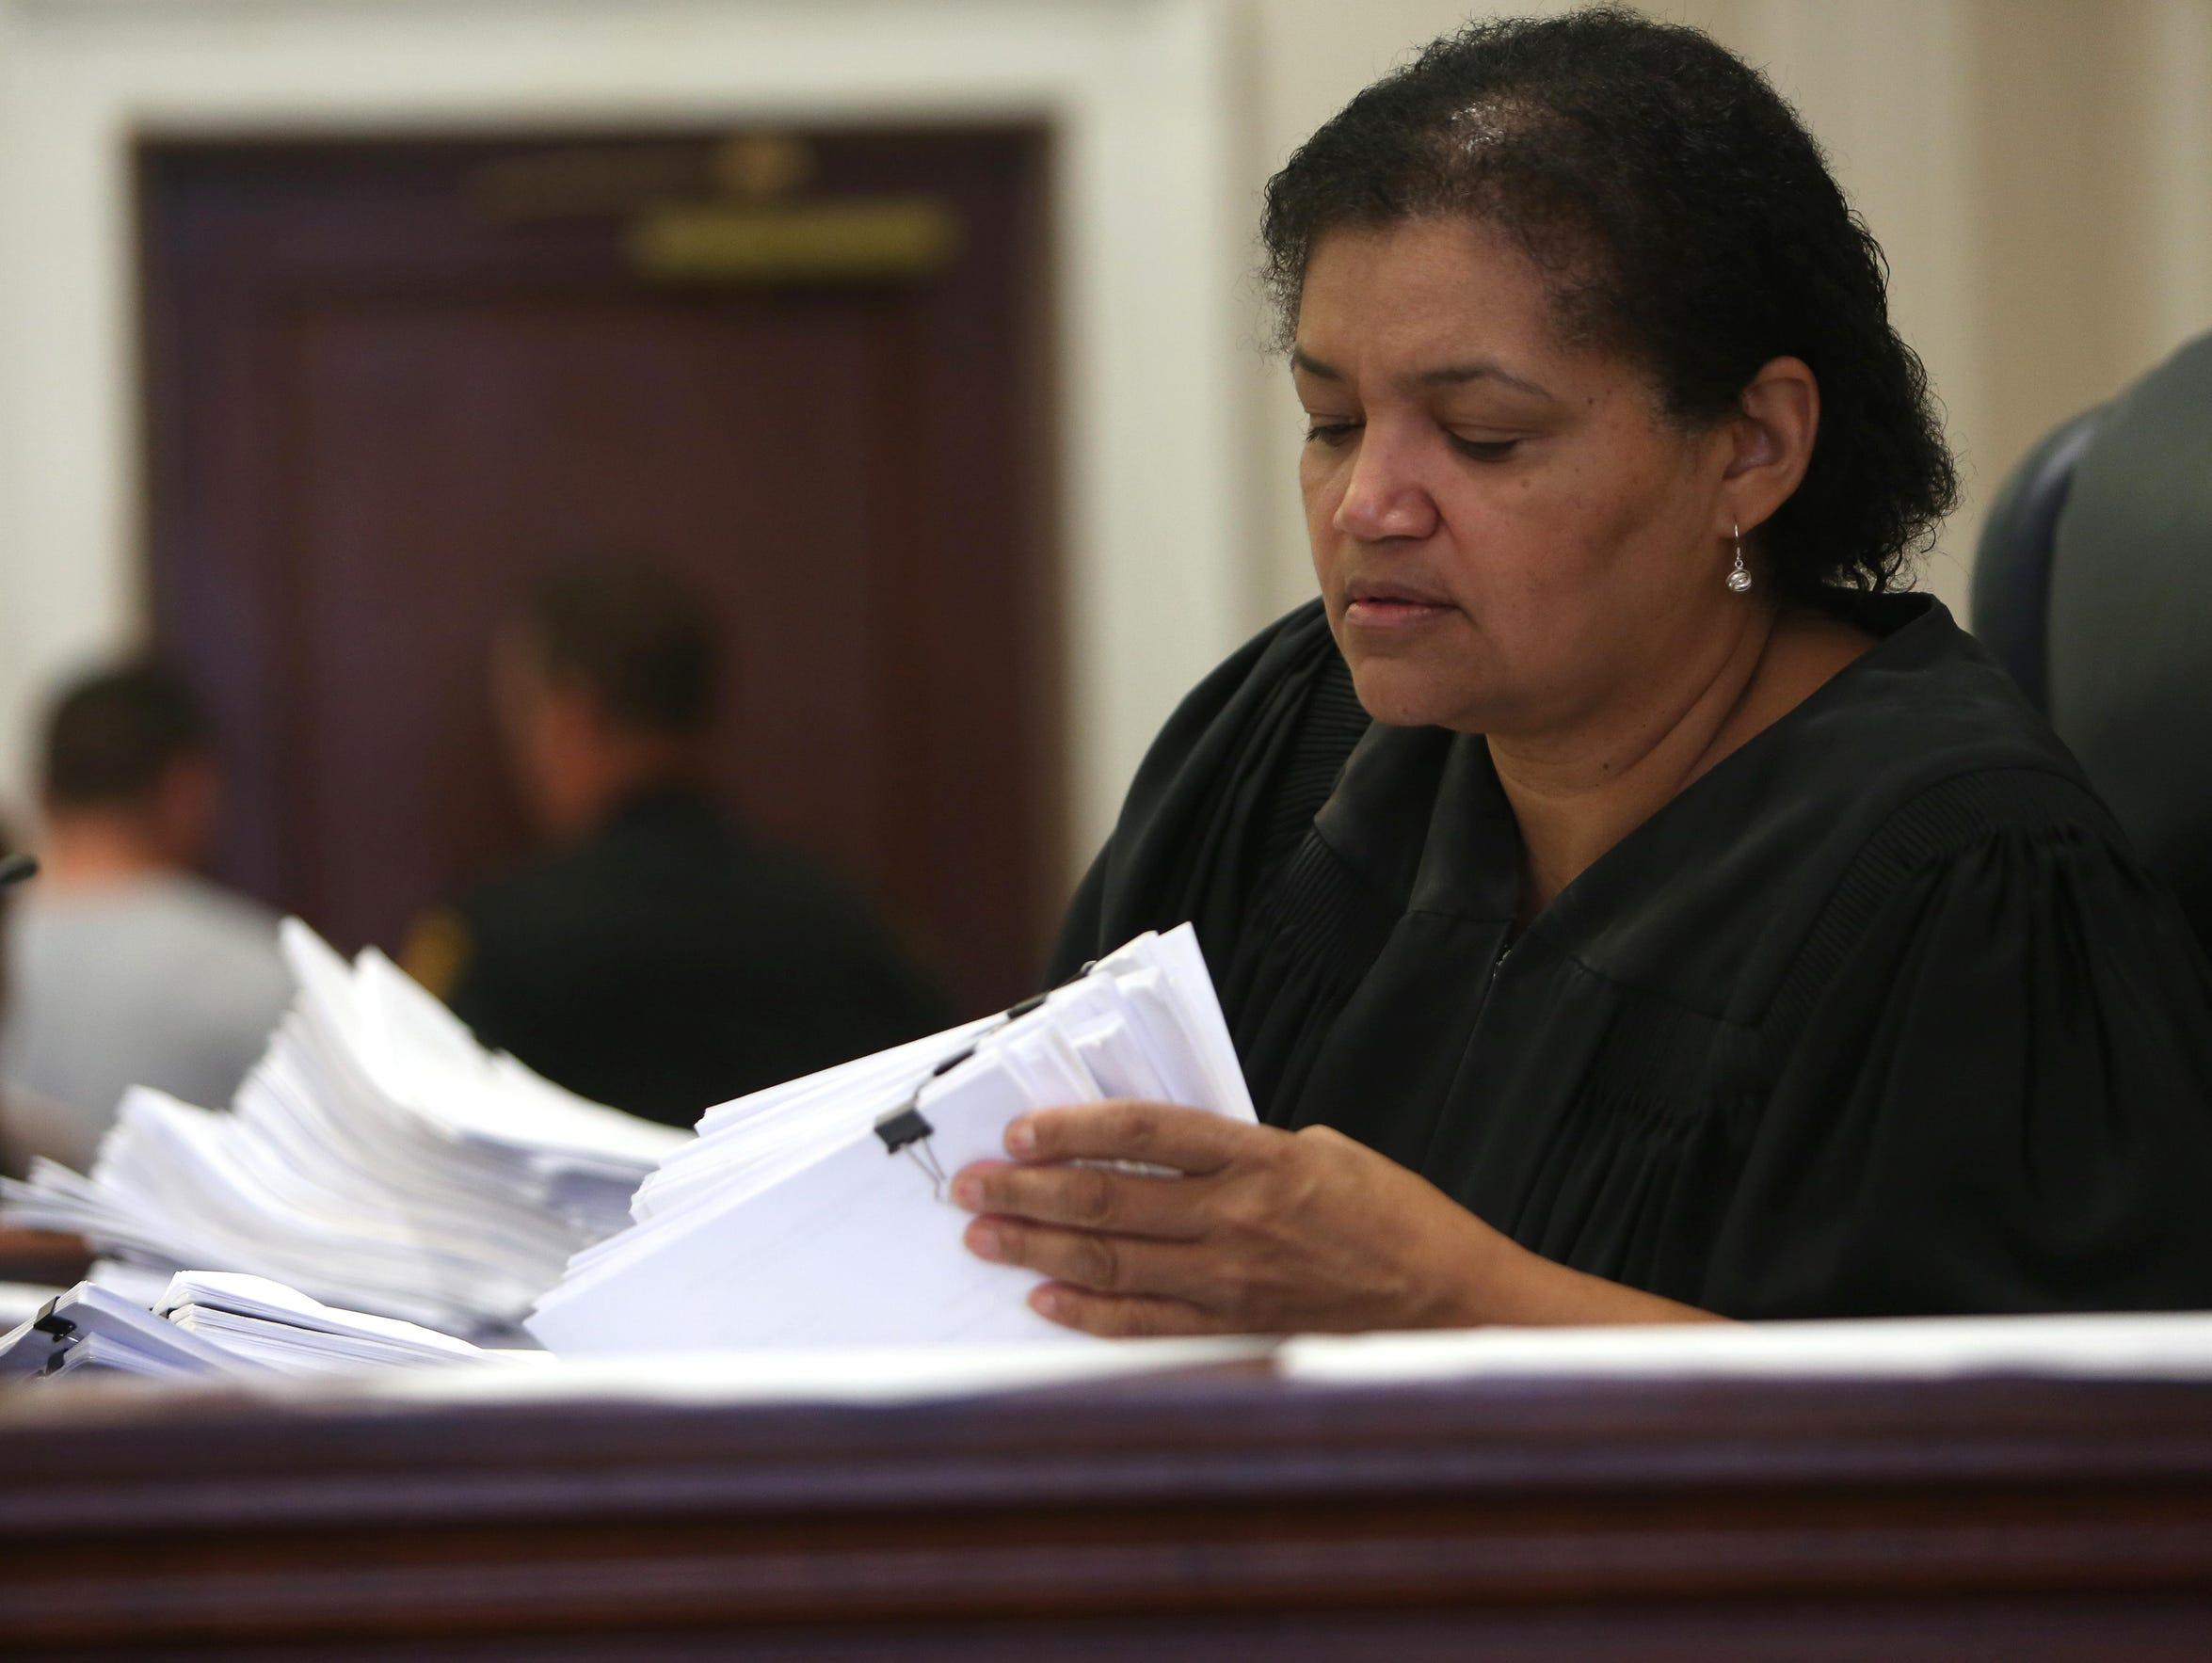 Hamilton County judge Kim Burke riffles through a stack